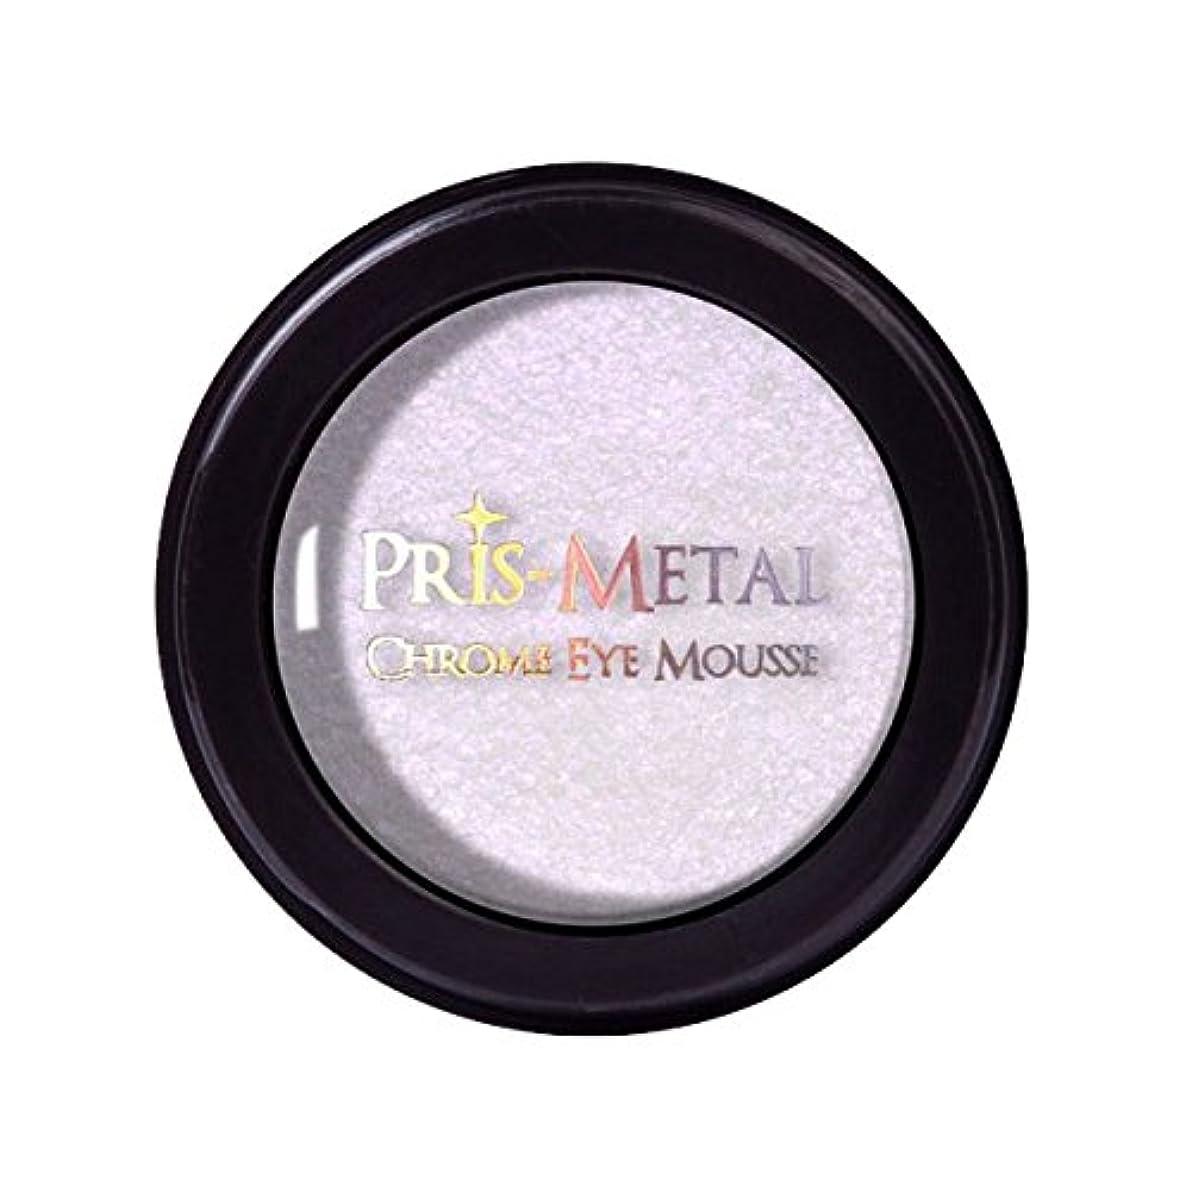 酸知性列車J. CAT BEAUTY Pris-Metal Chrome Eye Mousse - Pinky Promise (並行輸入品)